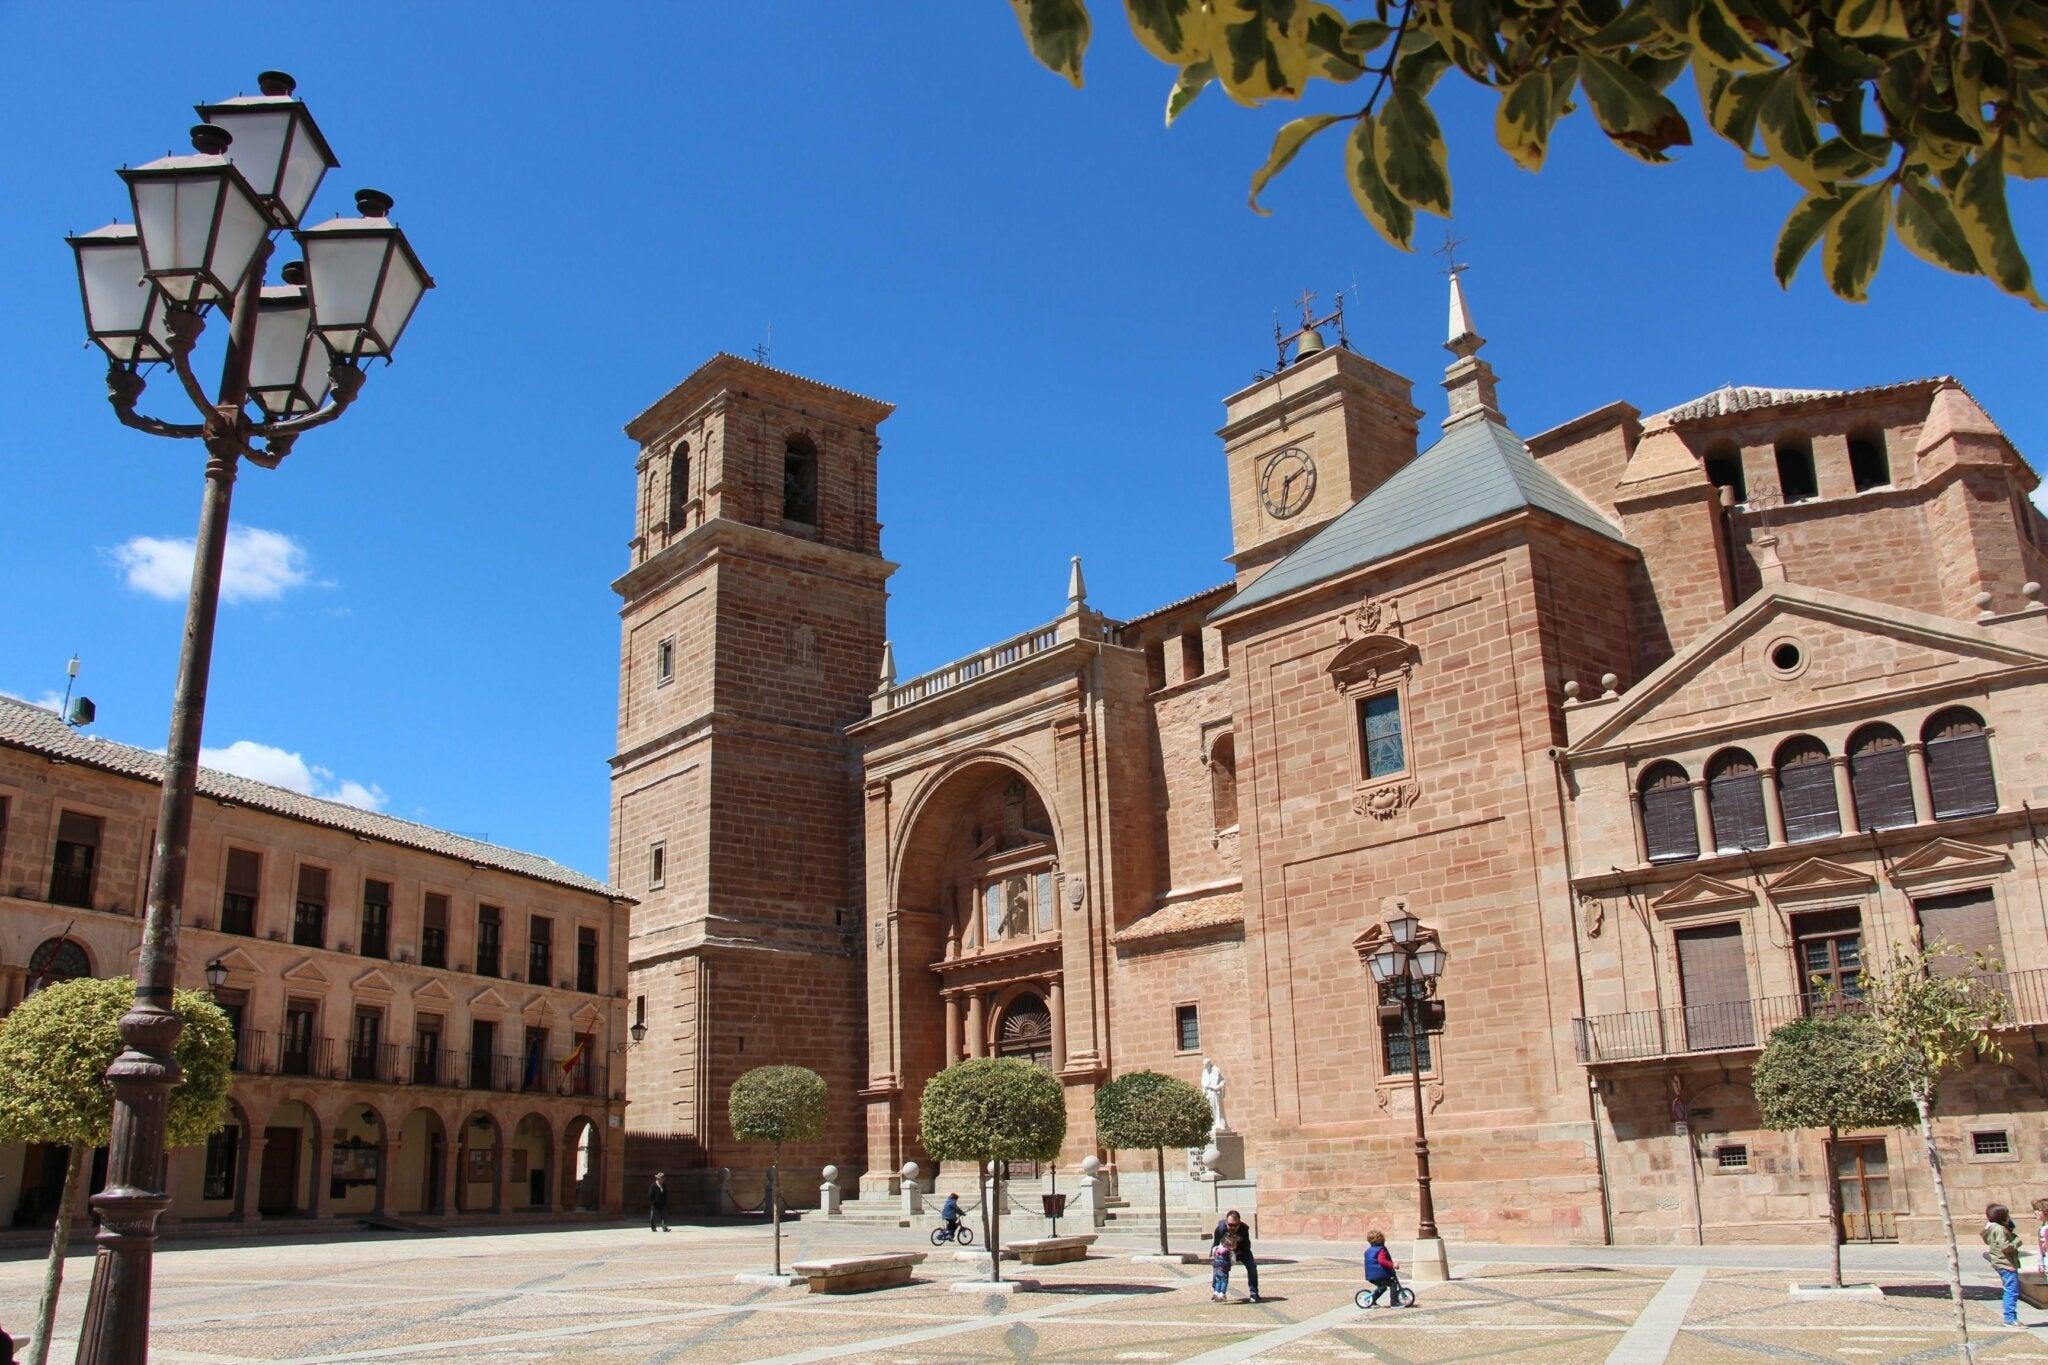 Iglesia de San Andrés Apostol, ubicada en la Plaza Mayor de Villanueva de los Infantes.